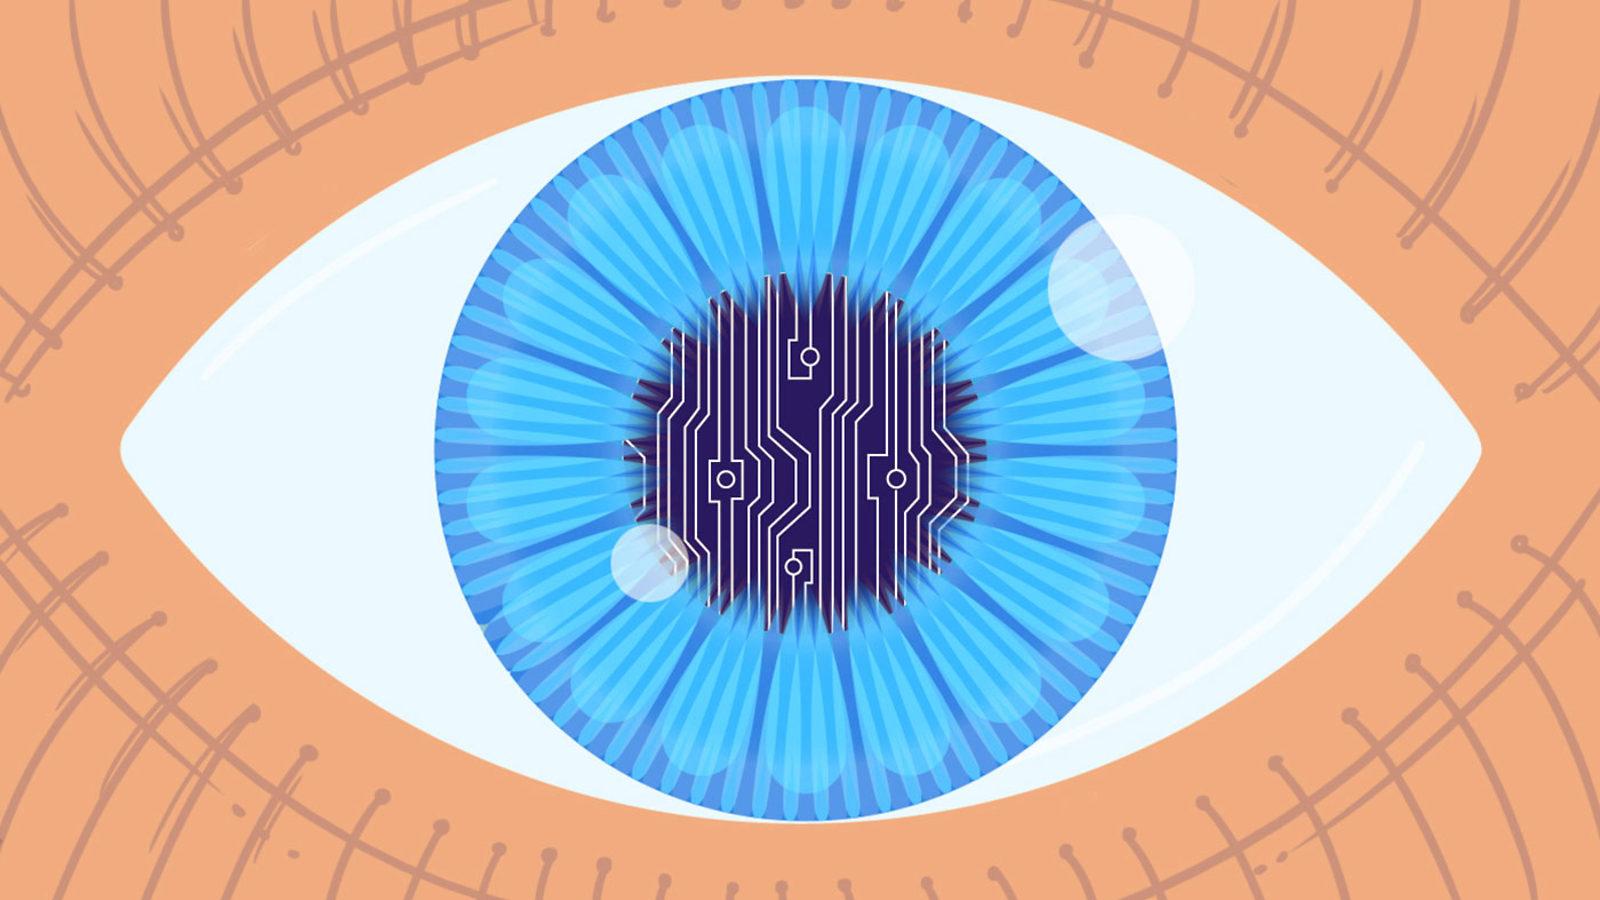 Application: EyeDetector